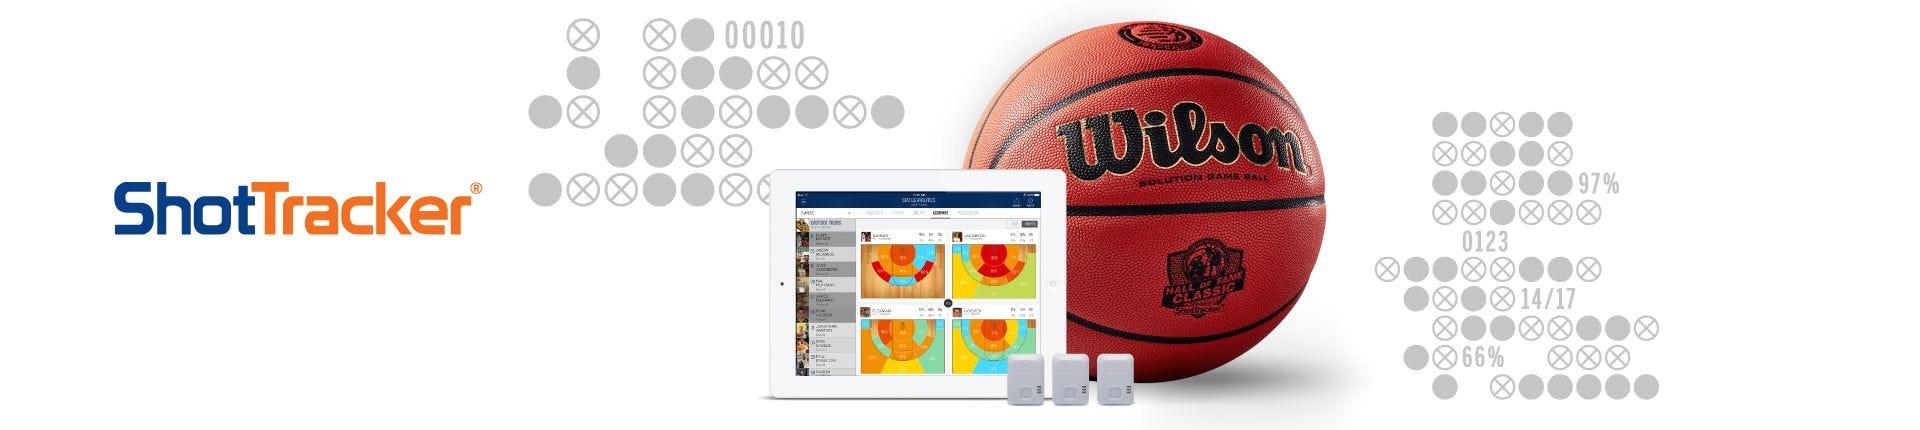 basketball shot tracker app